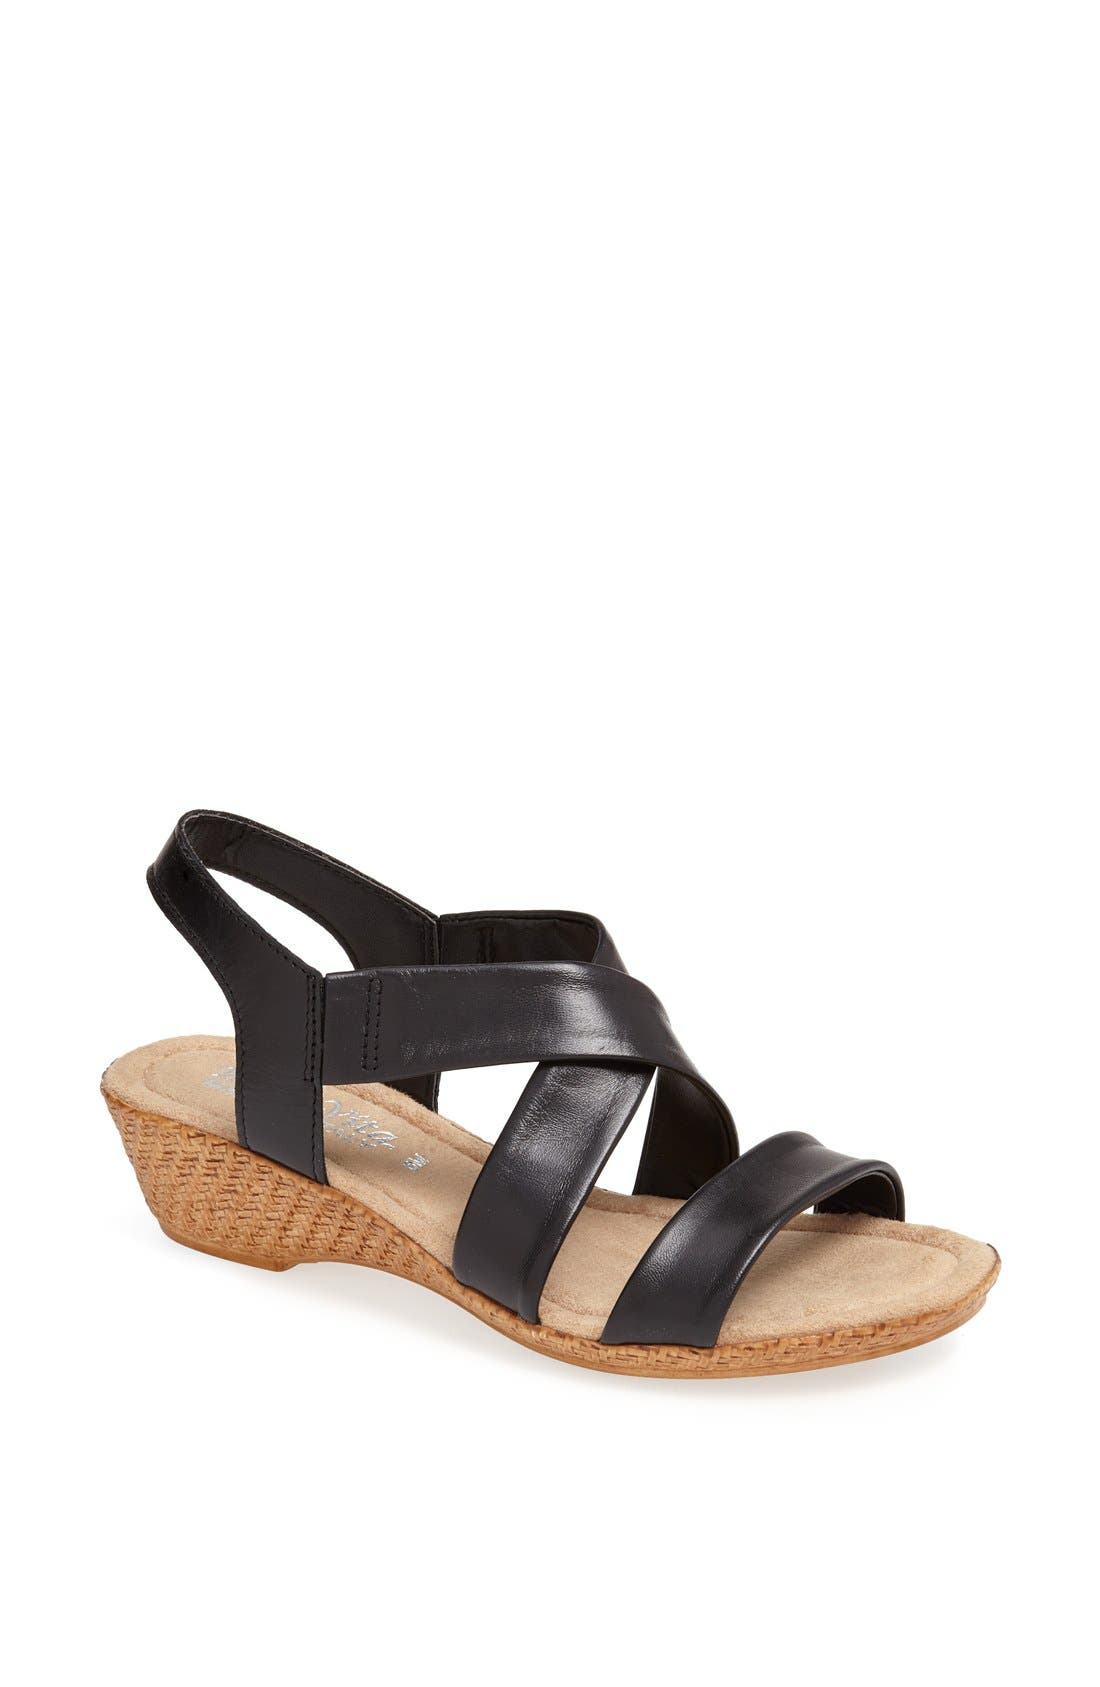 Main Image - Bella Vita 'Ciao' Wedge Sandal